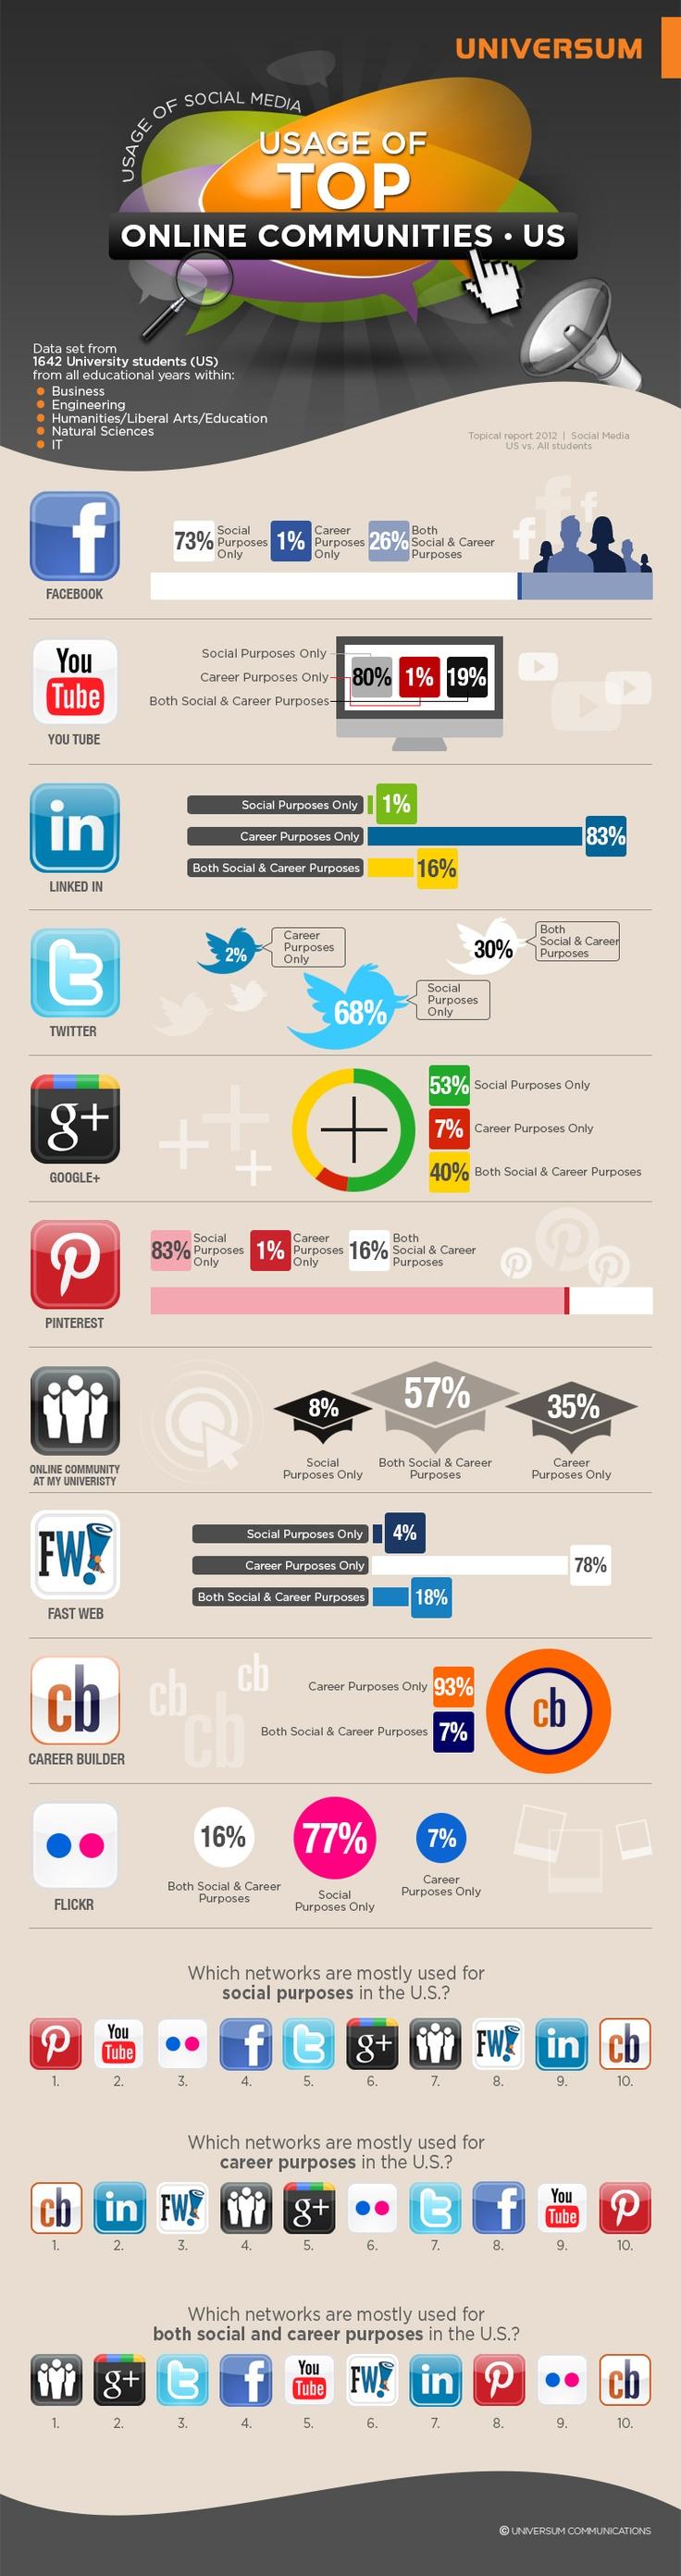 Social platforms US University students use for Careers Purposes #infographic via @universum_eb #EmployerBrand